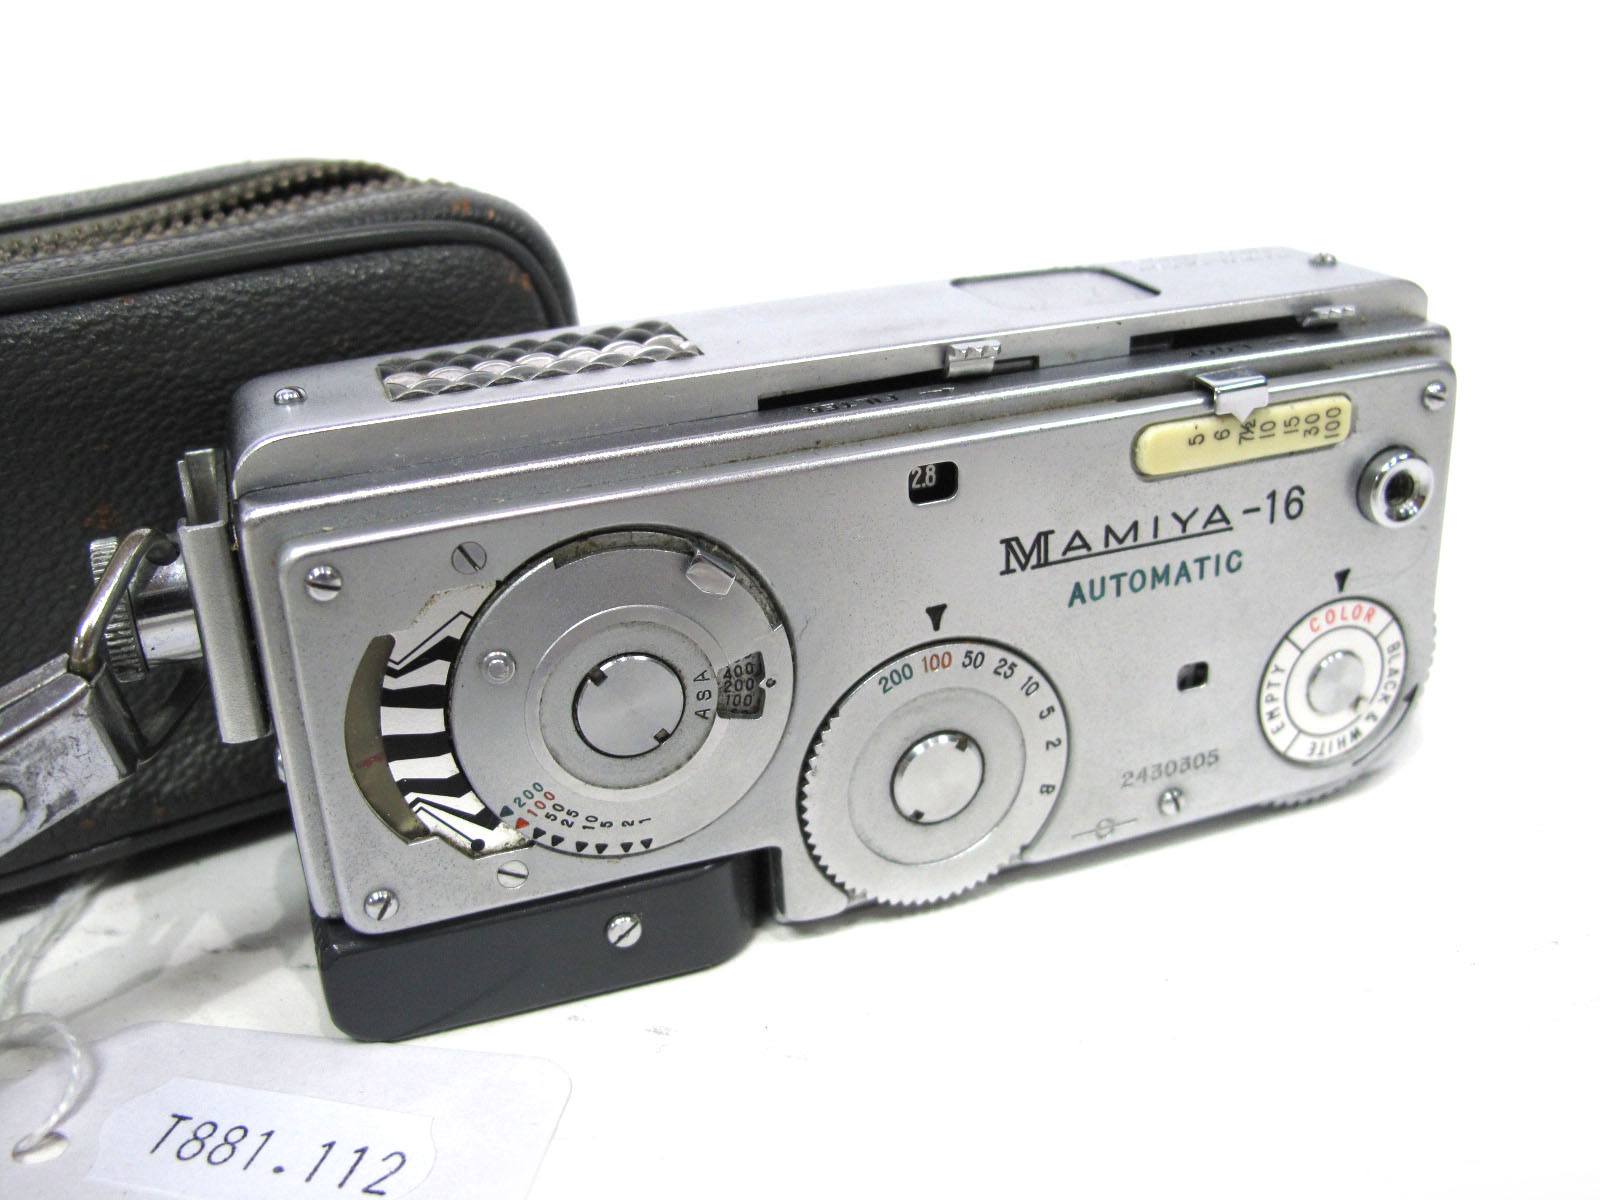 Mamiya-16 Automatic Camera, in case.